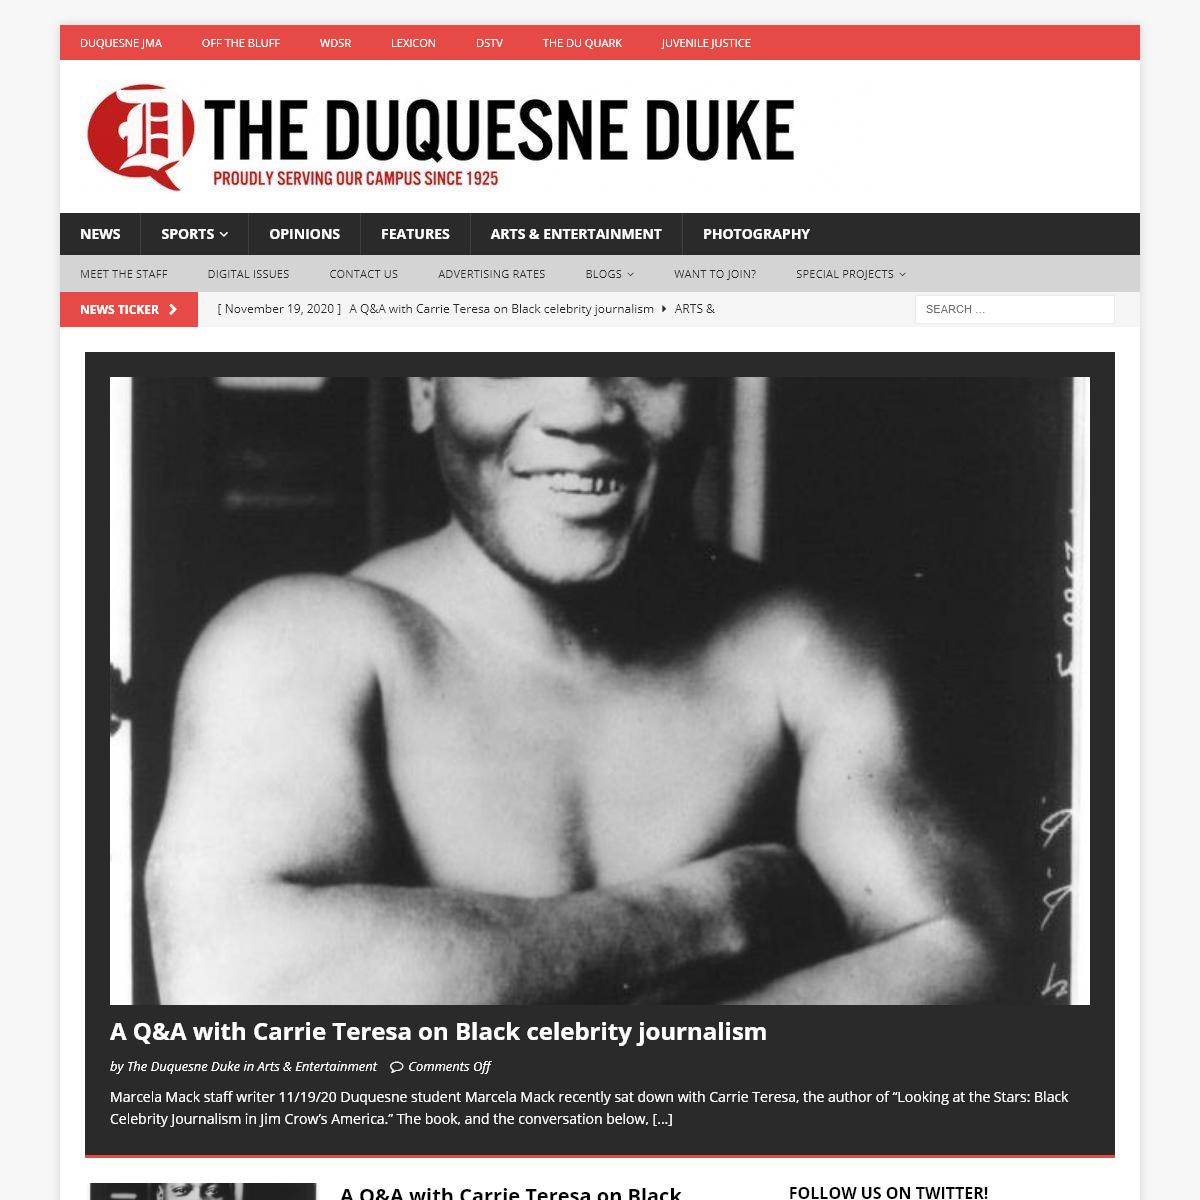 Home • The Duquesne Duke